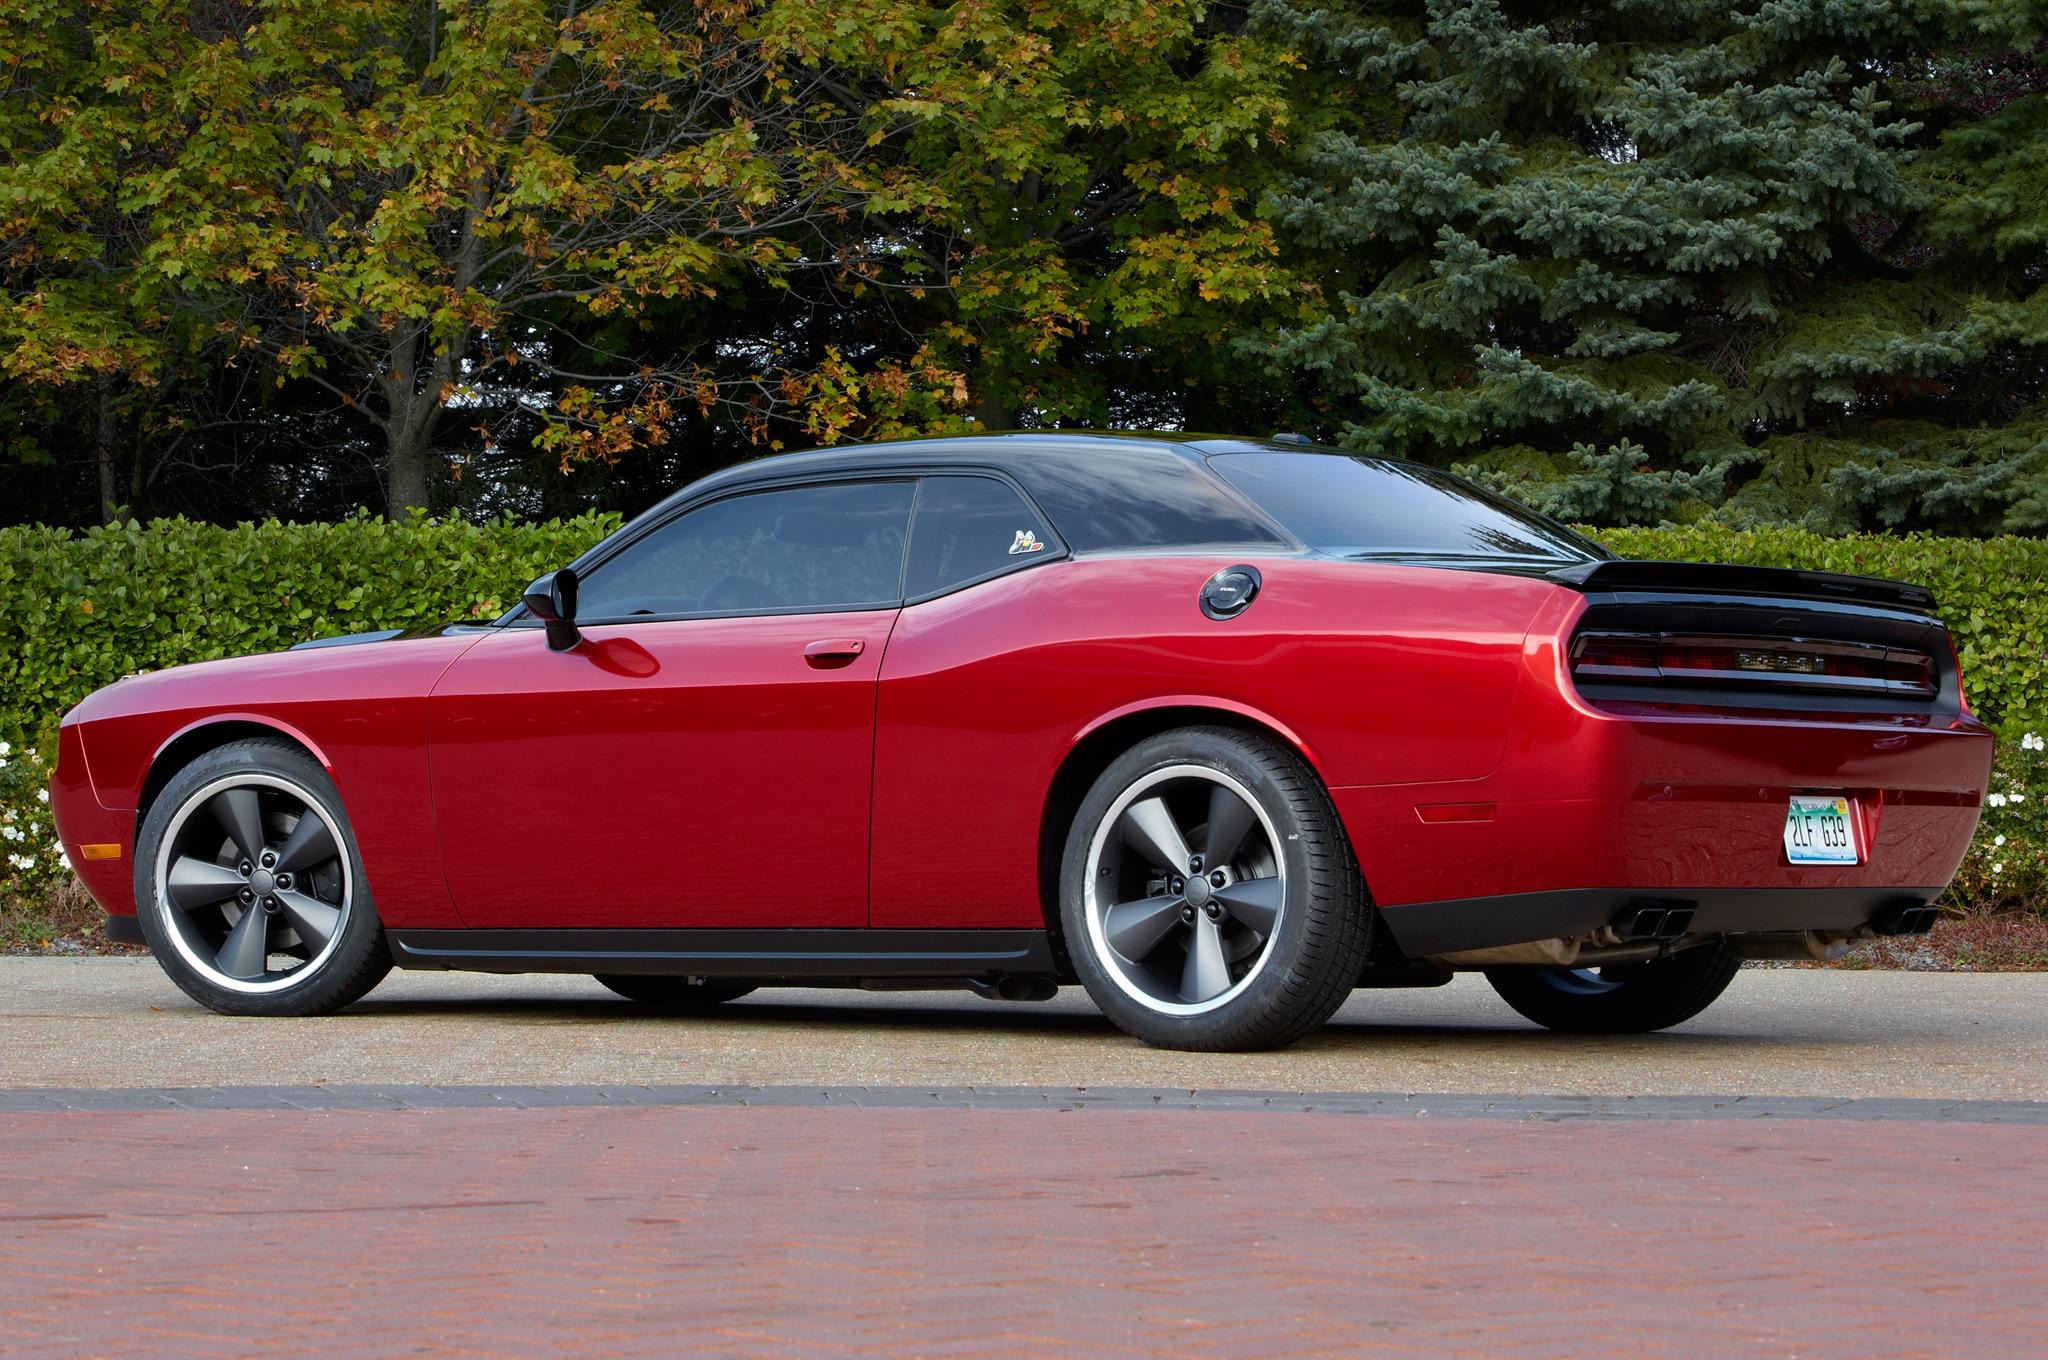 SEMA 2013 2014 Dodge Challenger Shaker Mopar Editions Unveiled